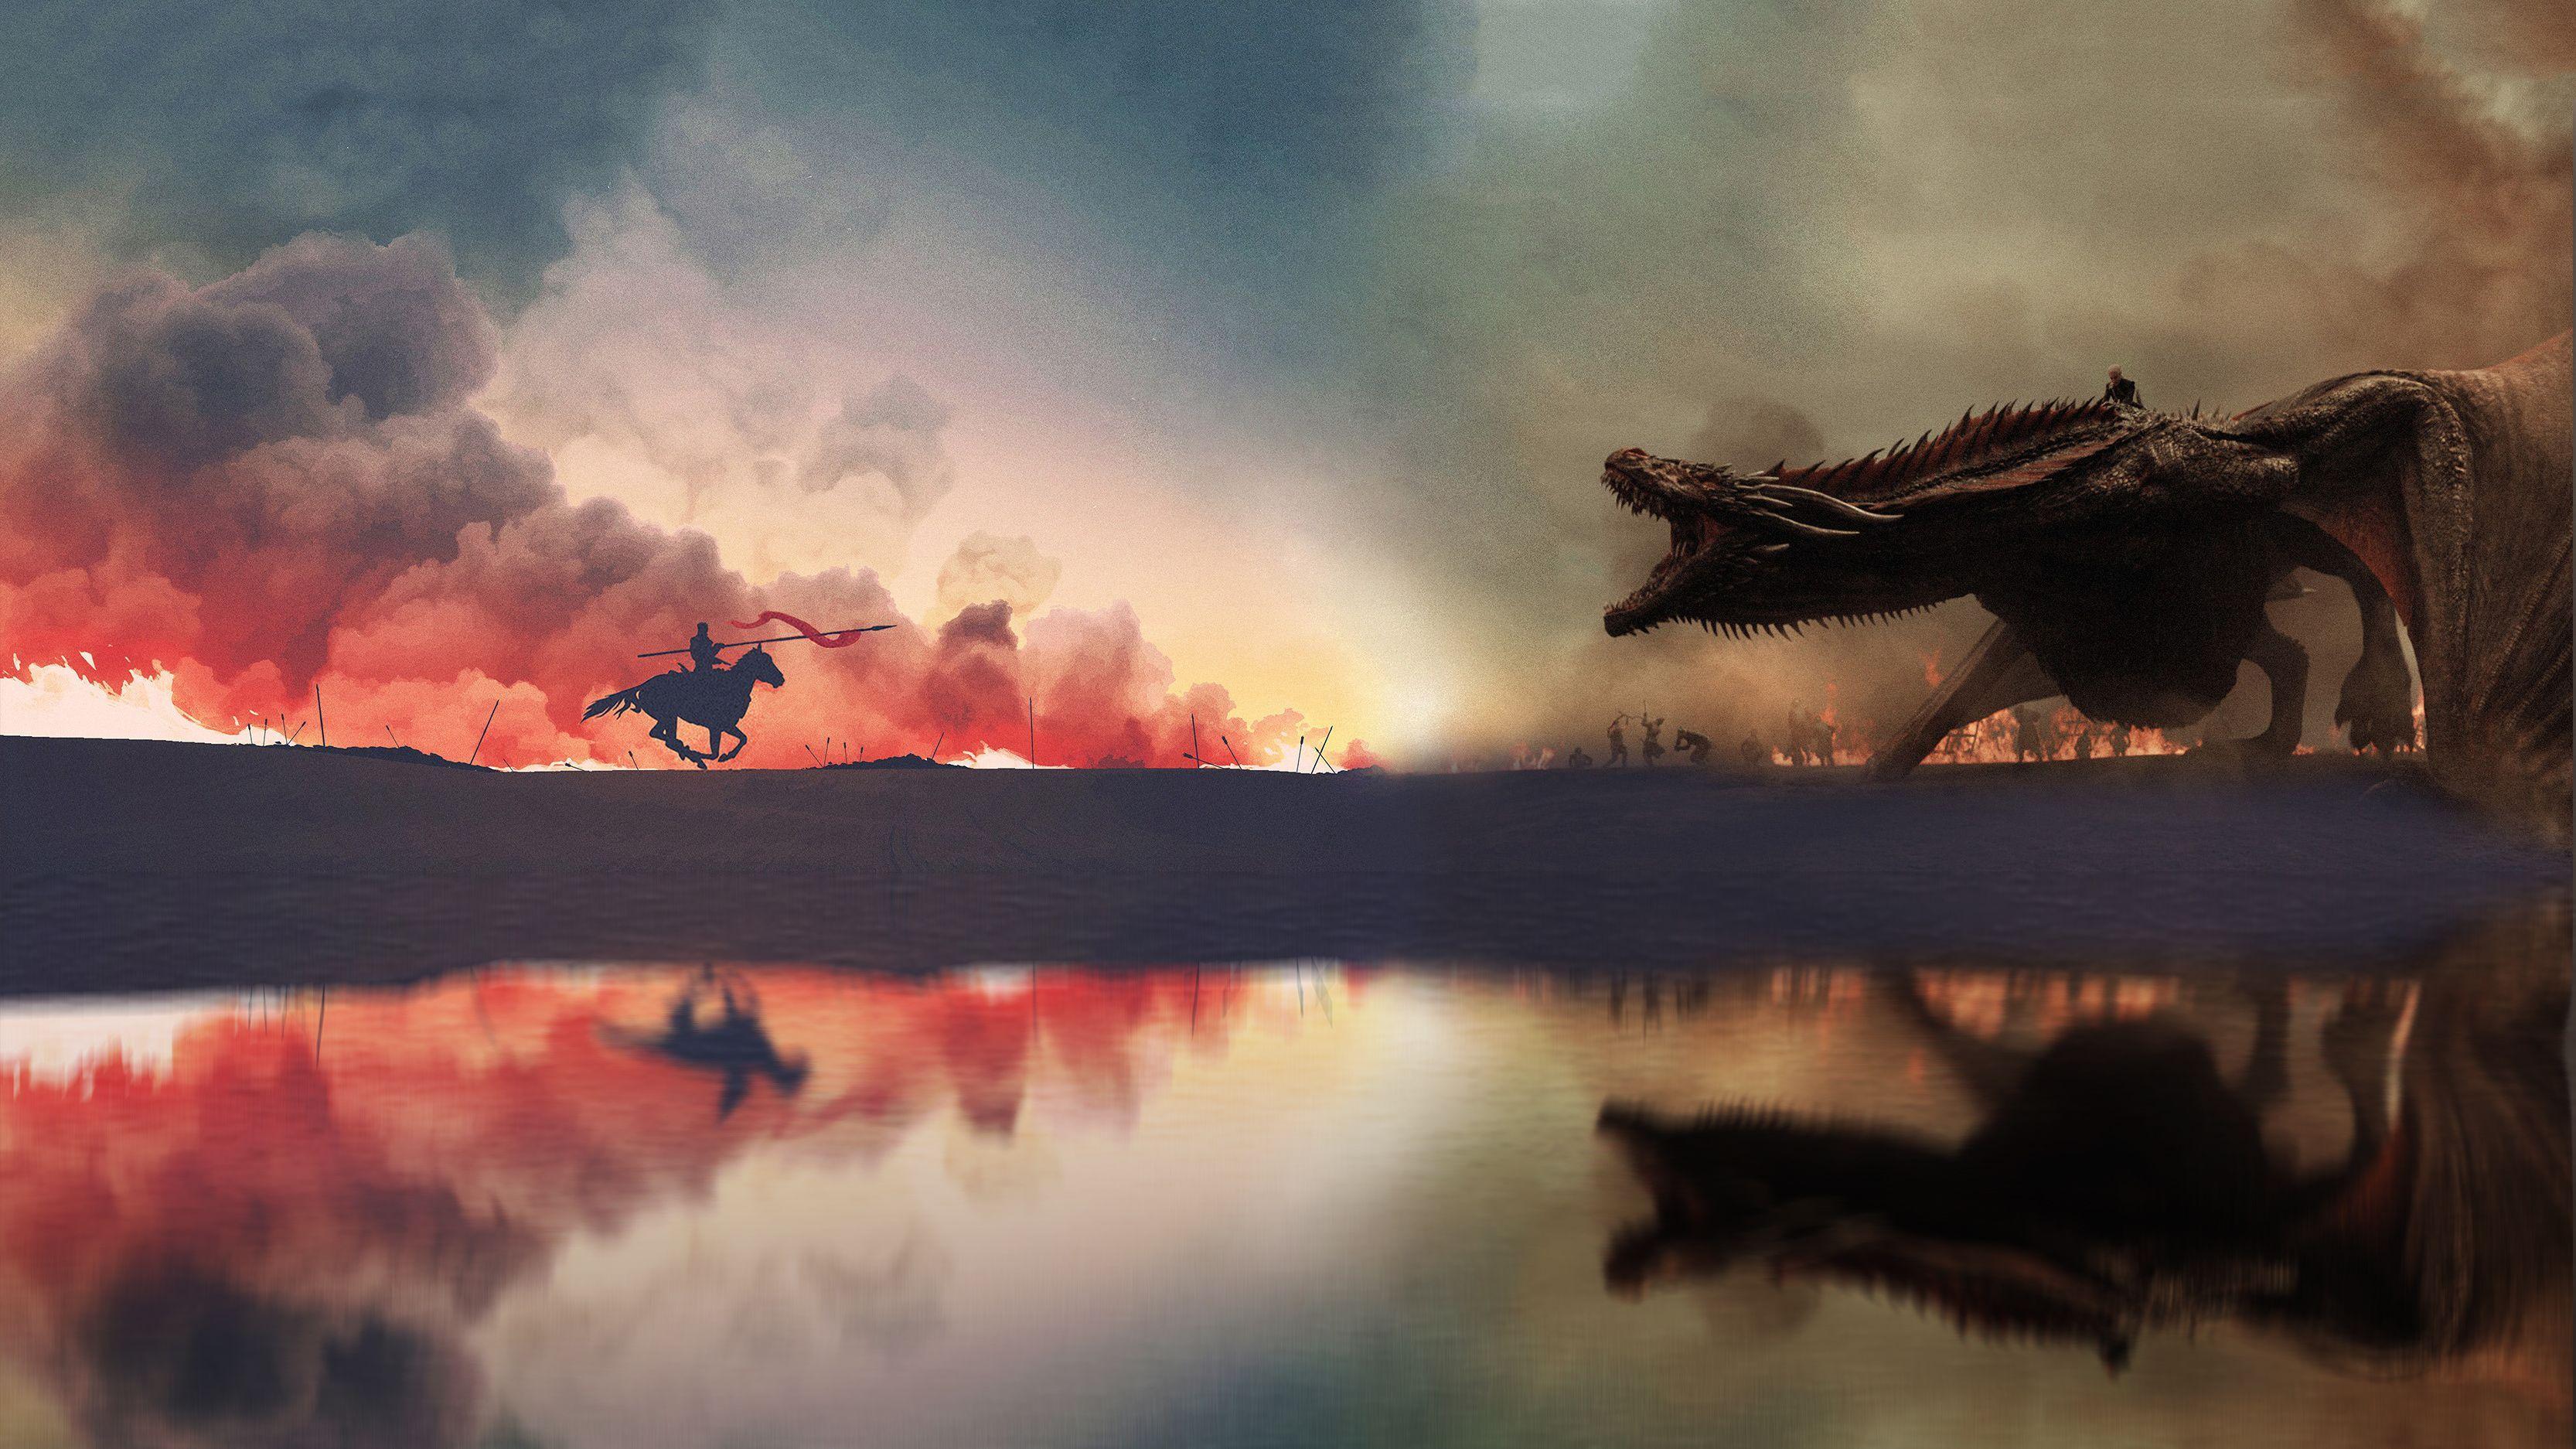 Game Of Thrones War Has Started Artwork 4k 6v Ultra Hd